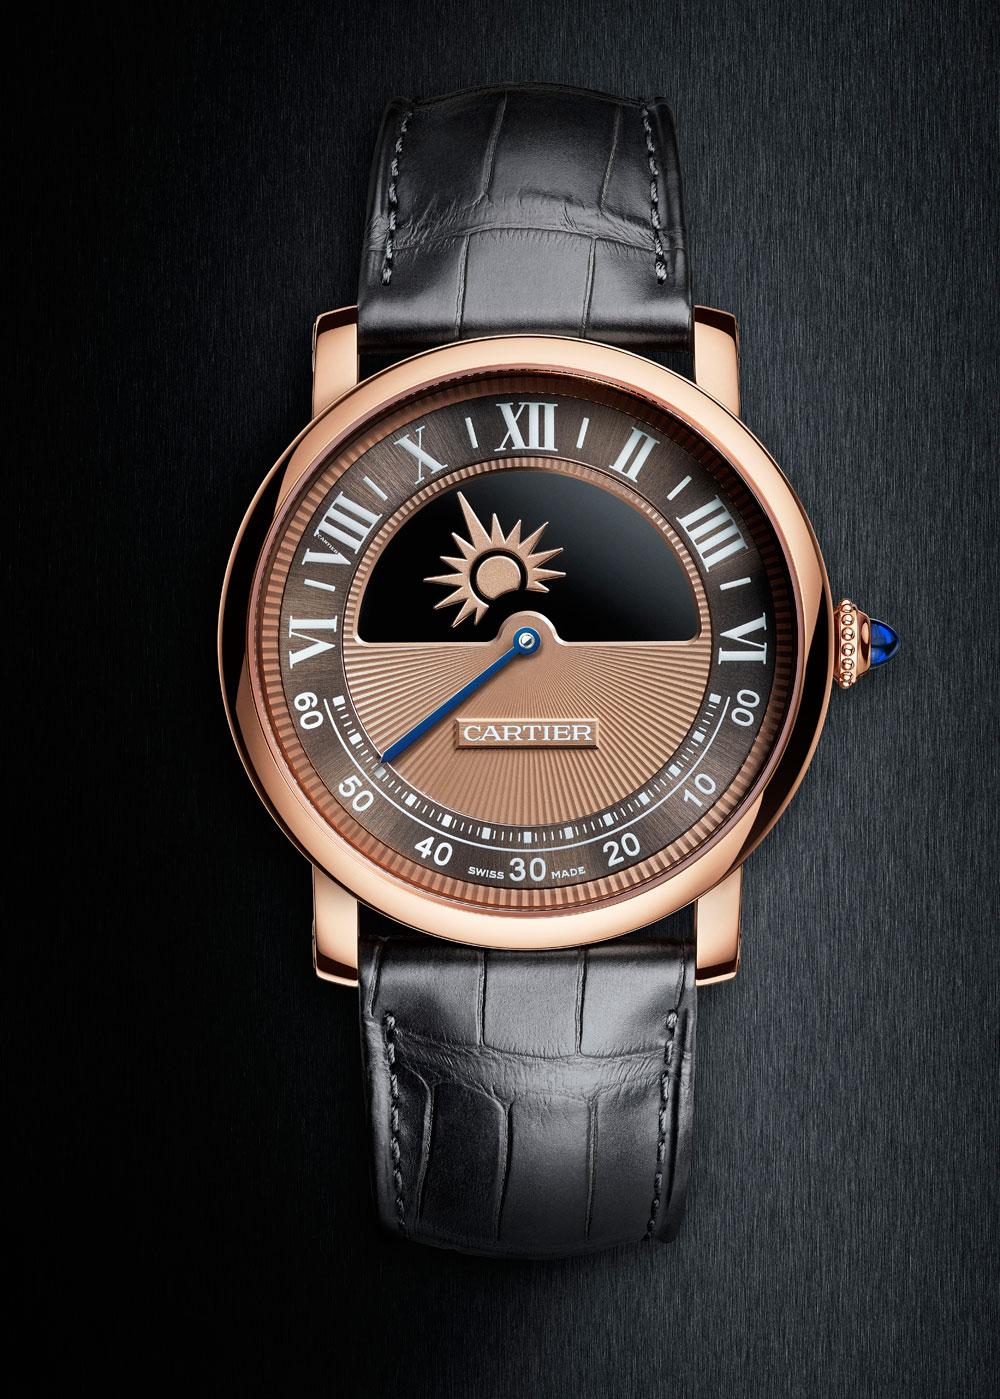 reloj ROTONDE DE CARTIER MYSTERIOUS DAY & NIGHT